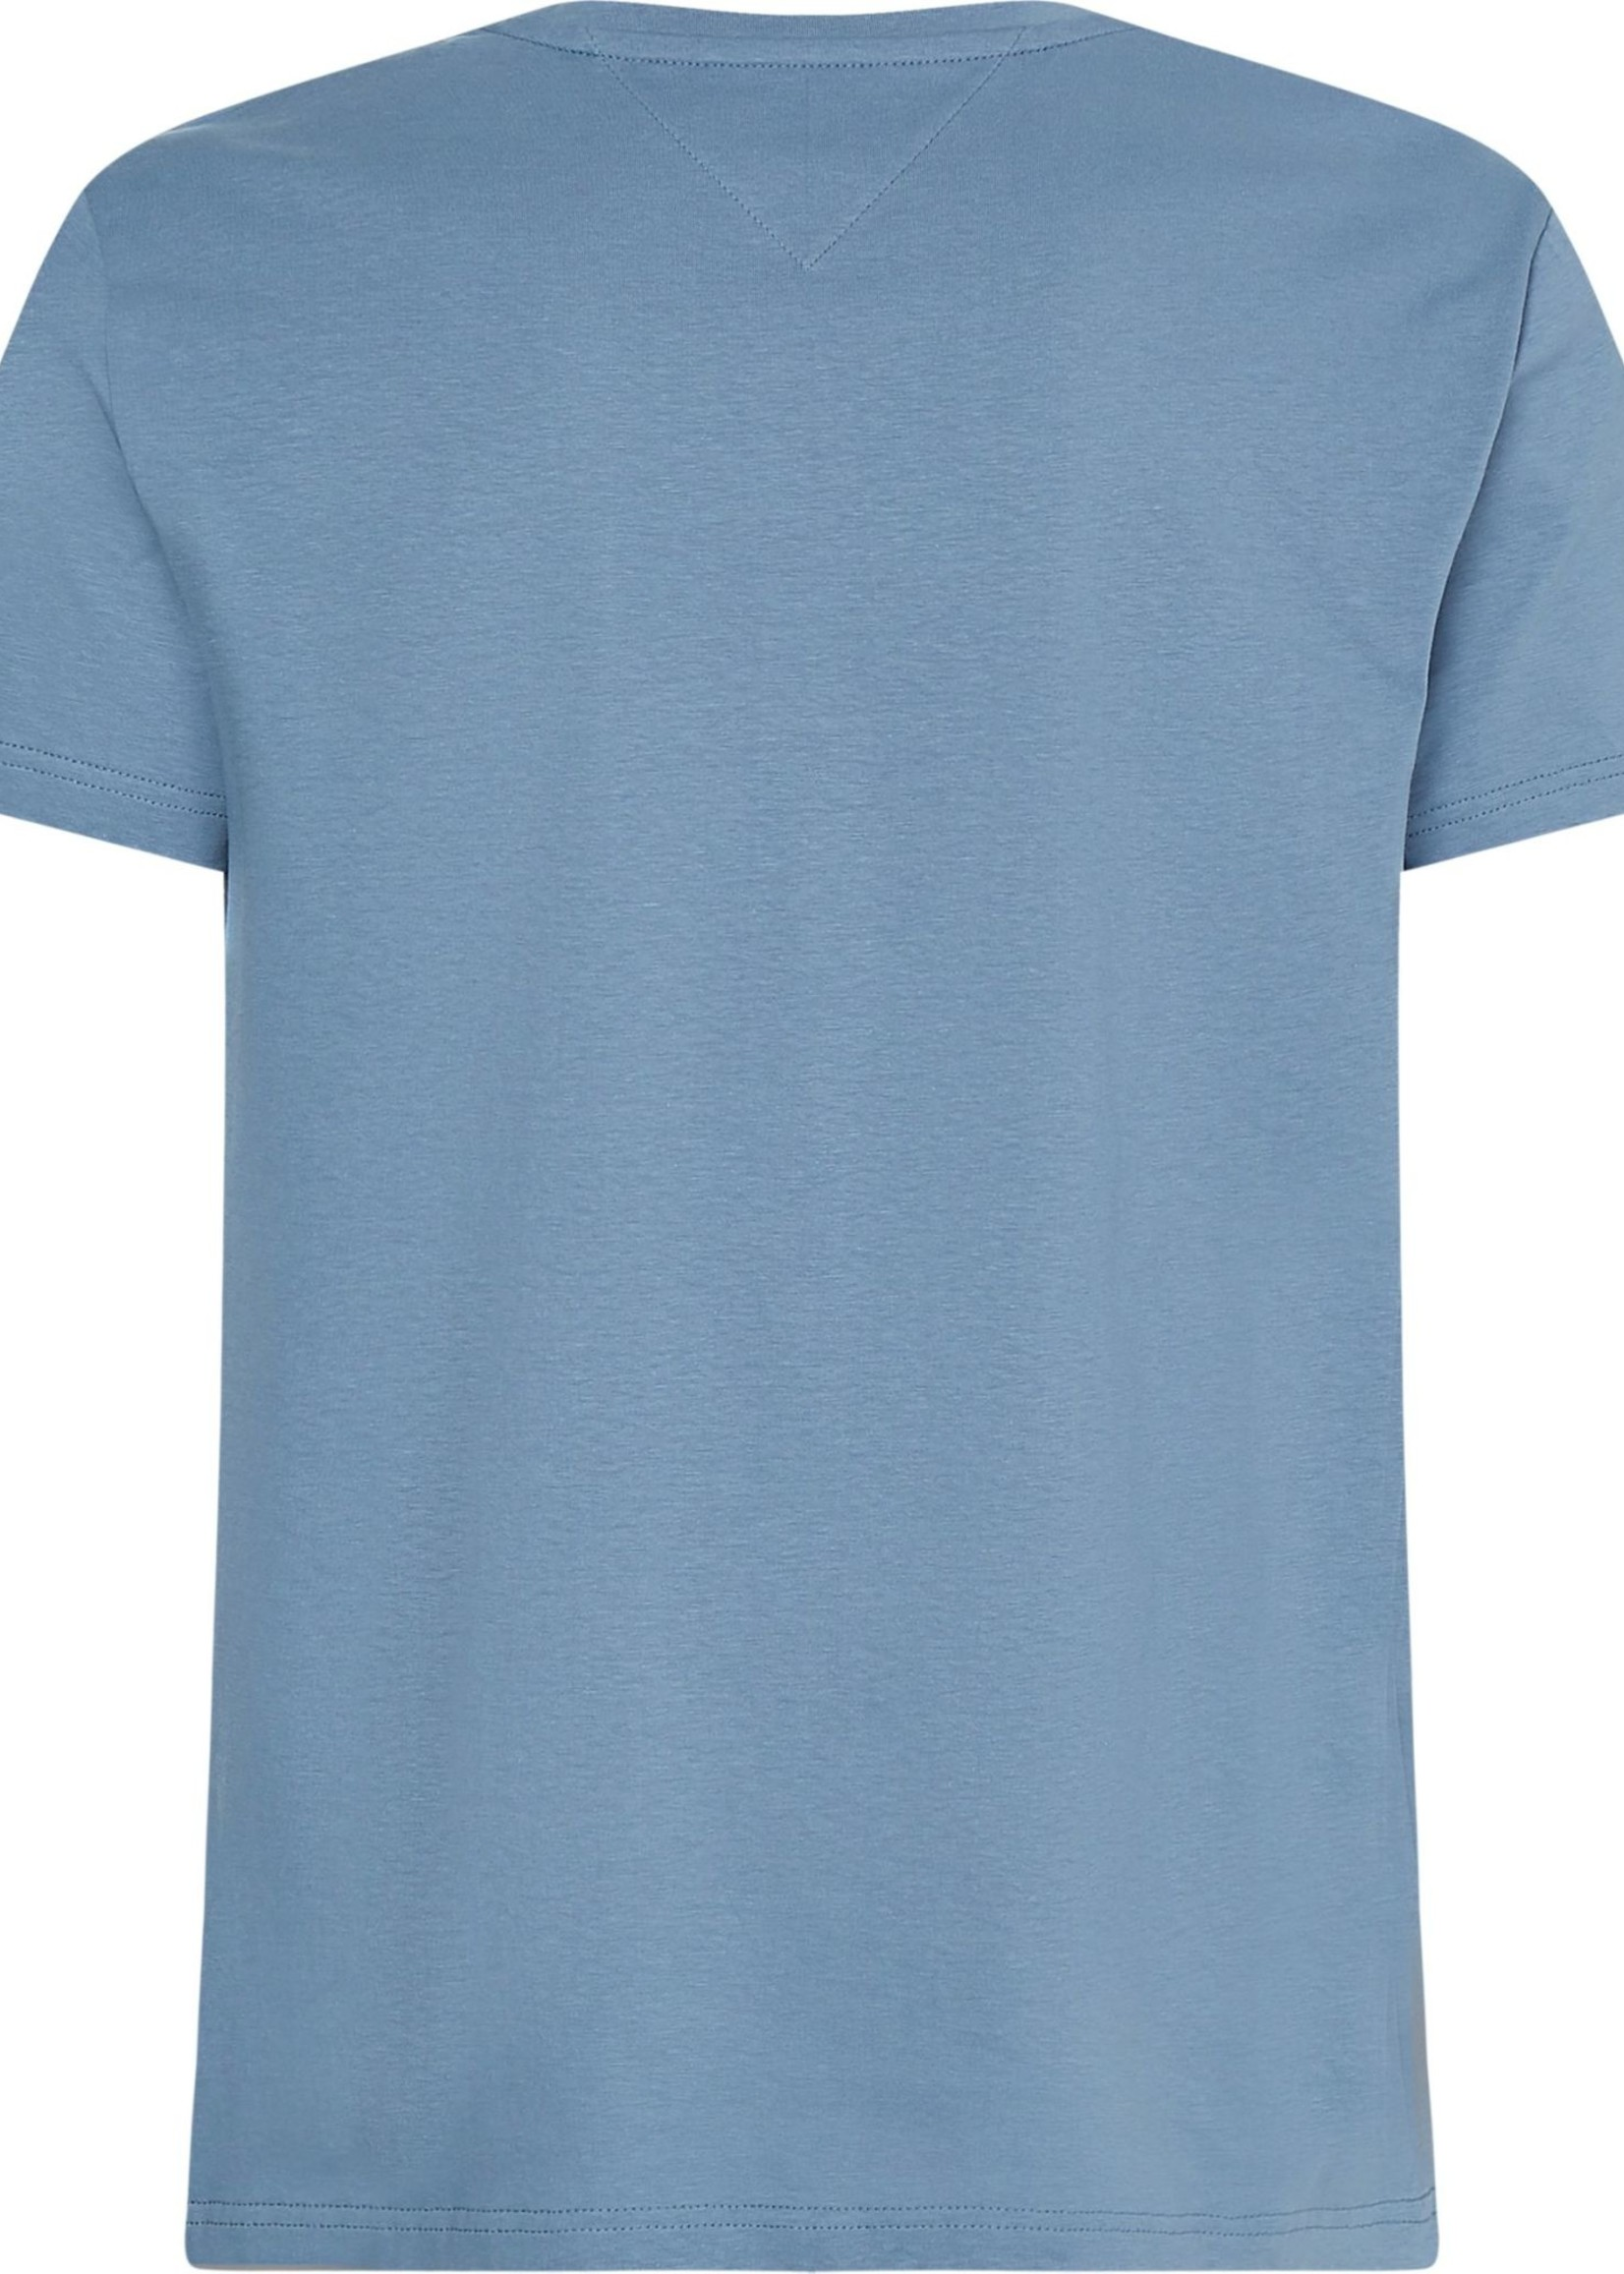 Tommy Hilfiger T-shirt en coton bio à logo | Bleu | Tommy Hilfiger